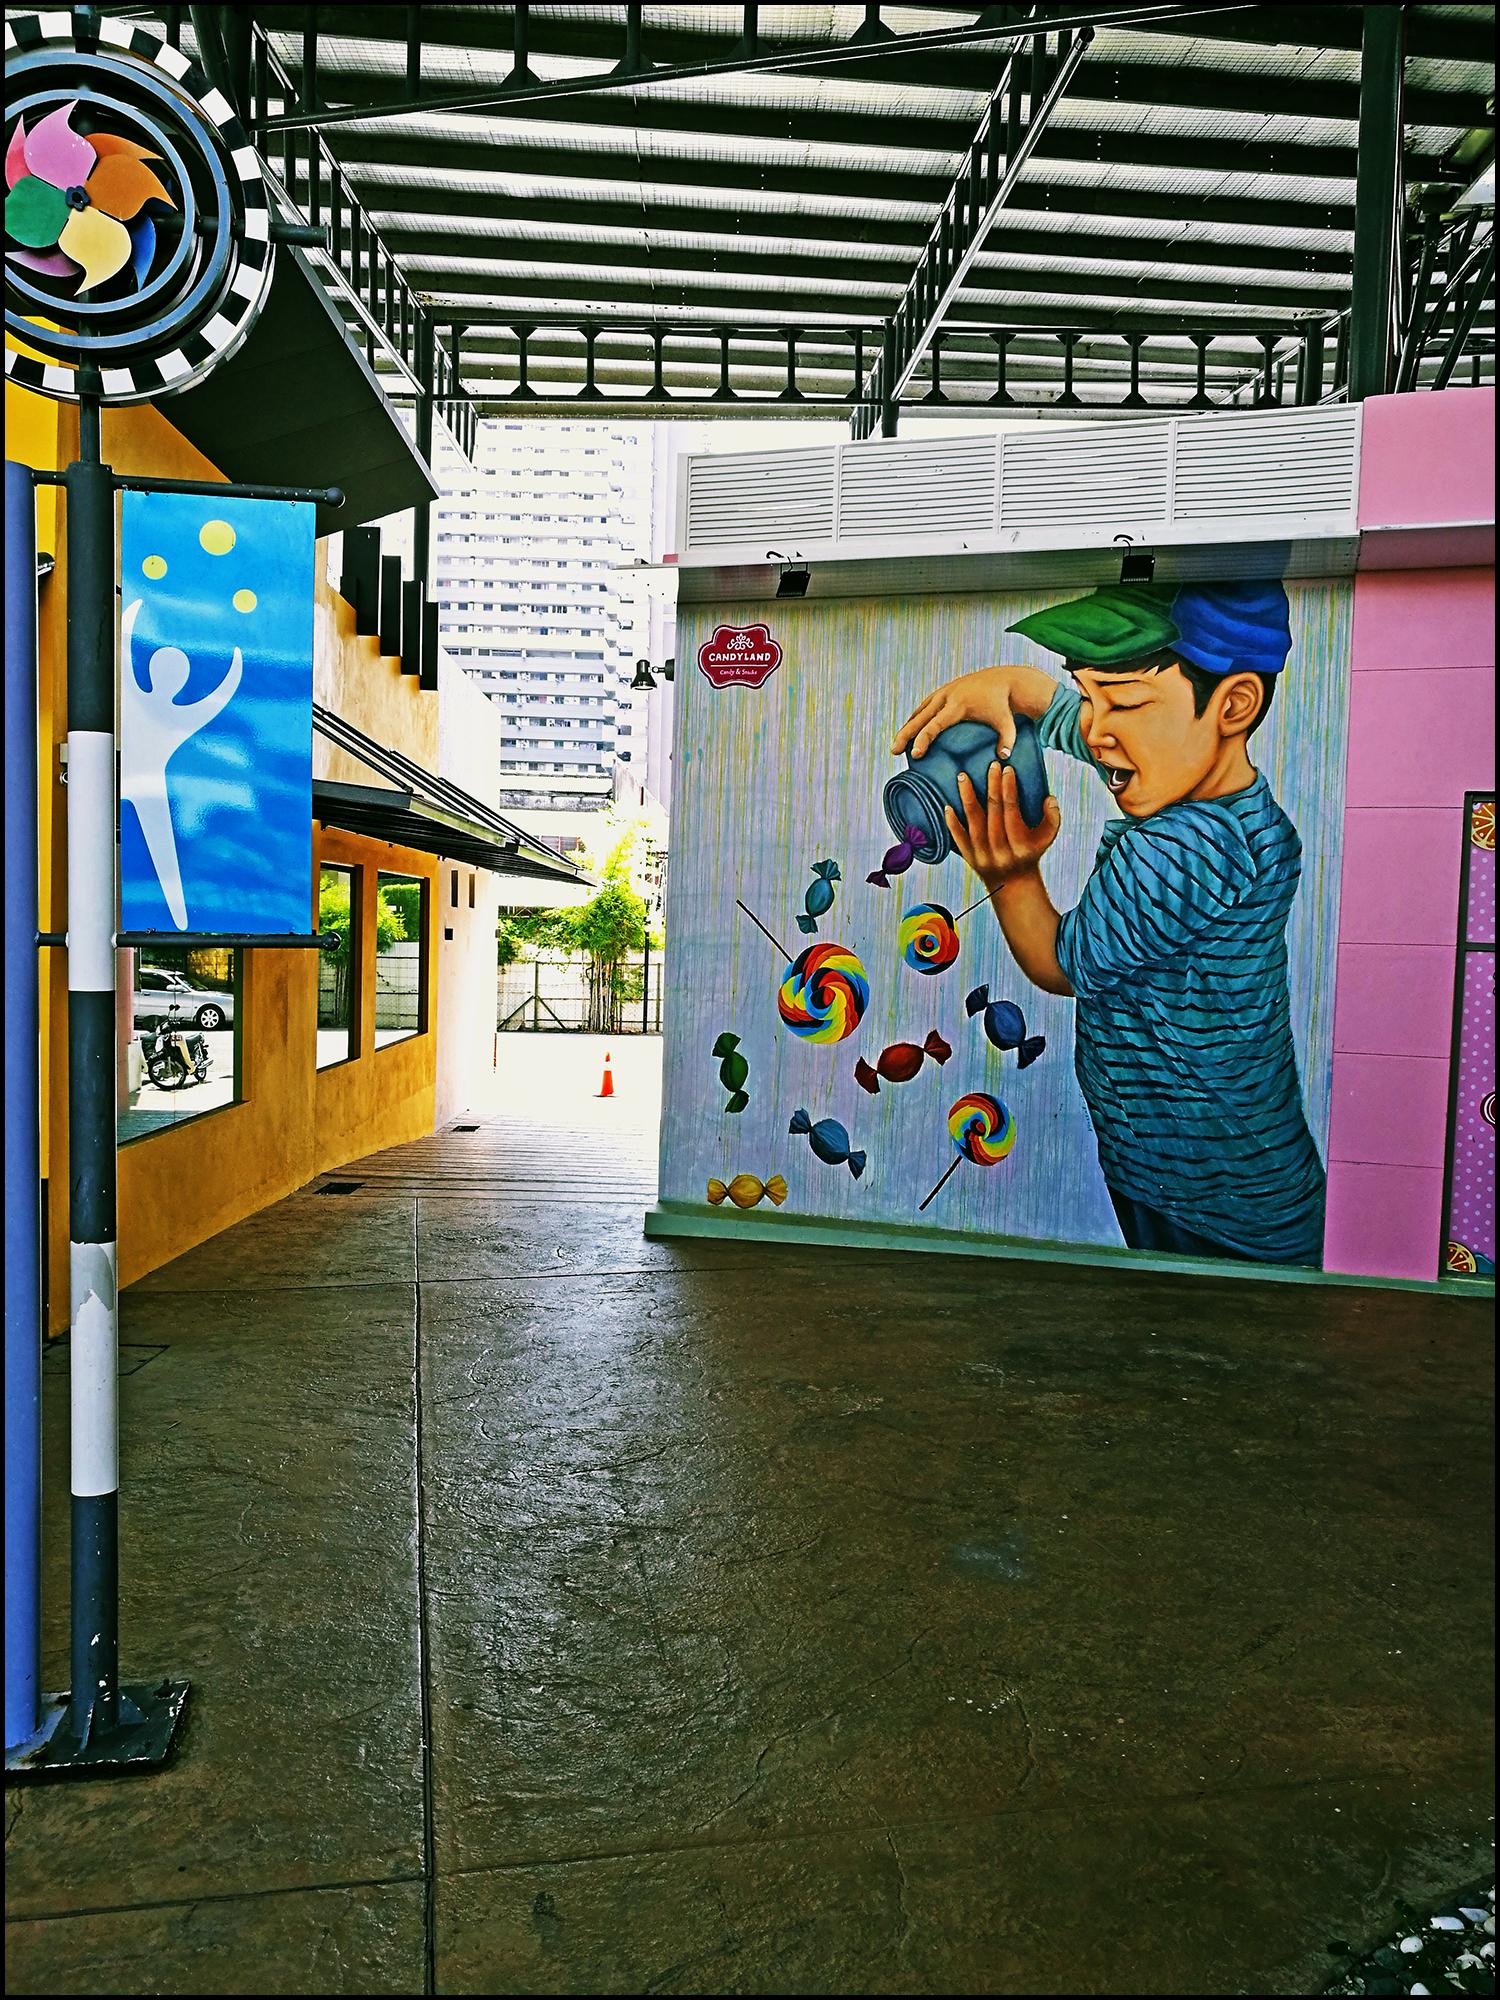 Penang Street Art The Candy Boy Perspective of Penang